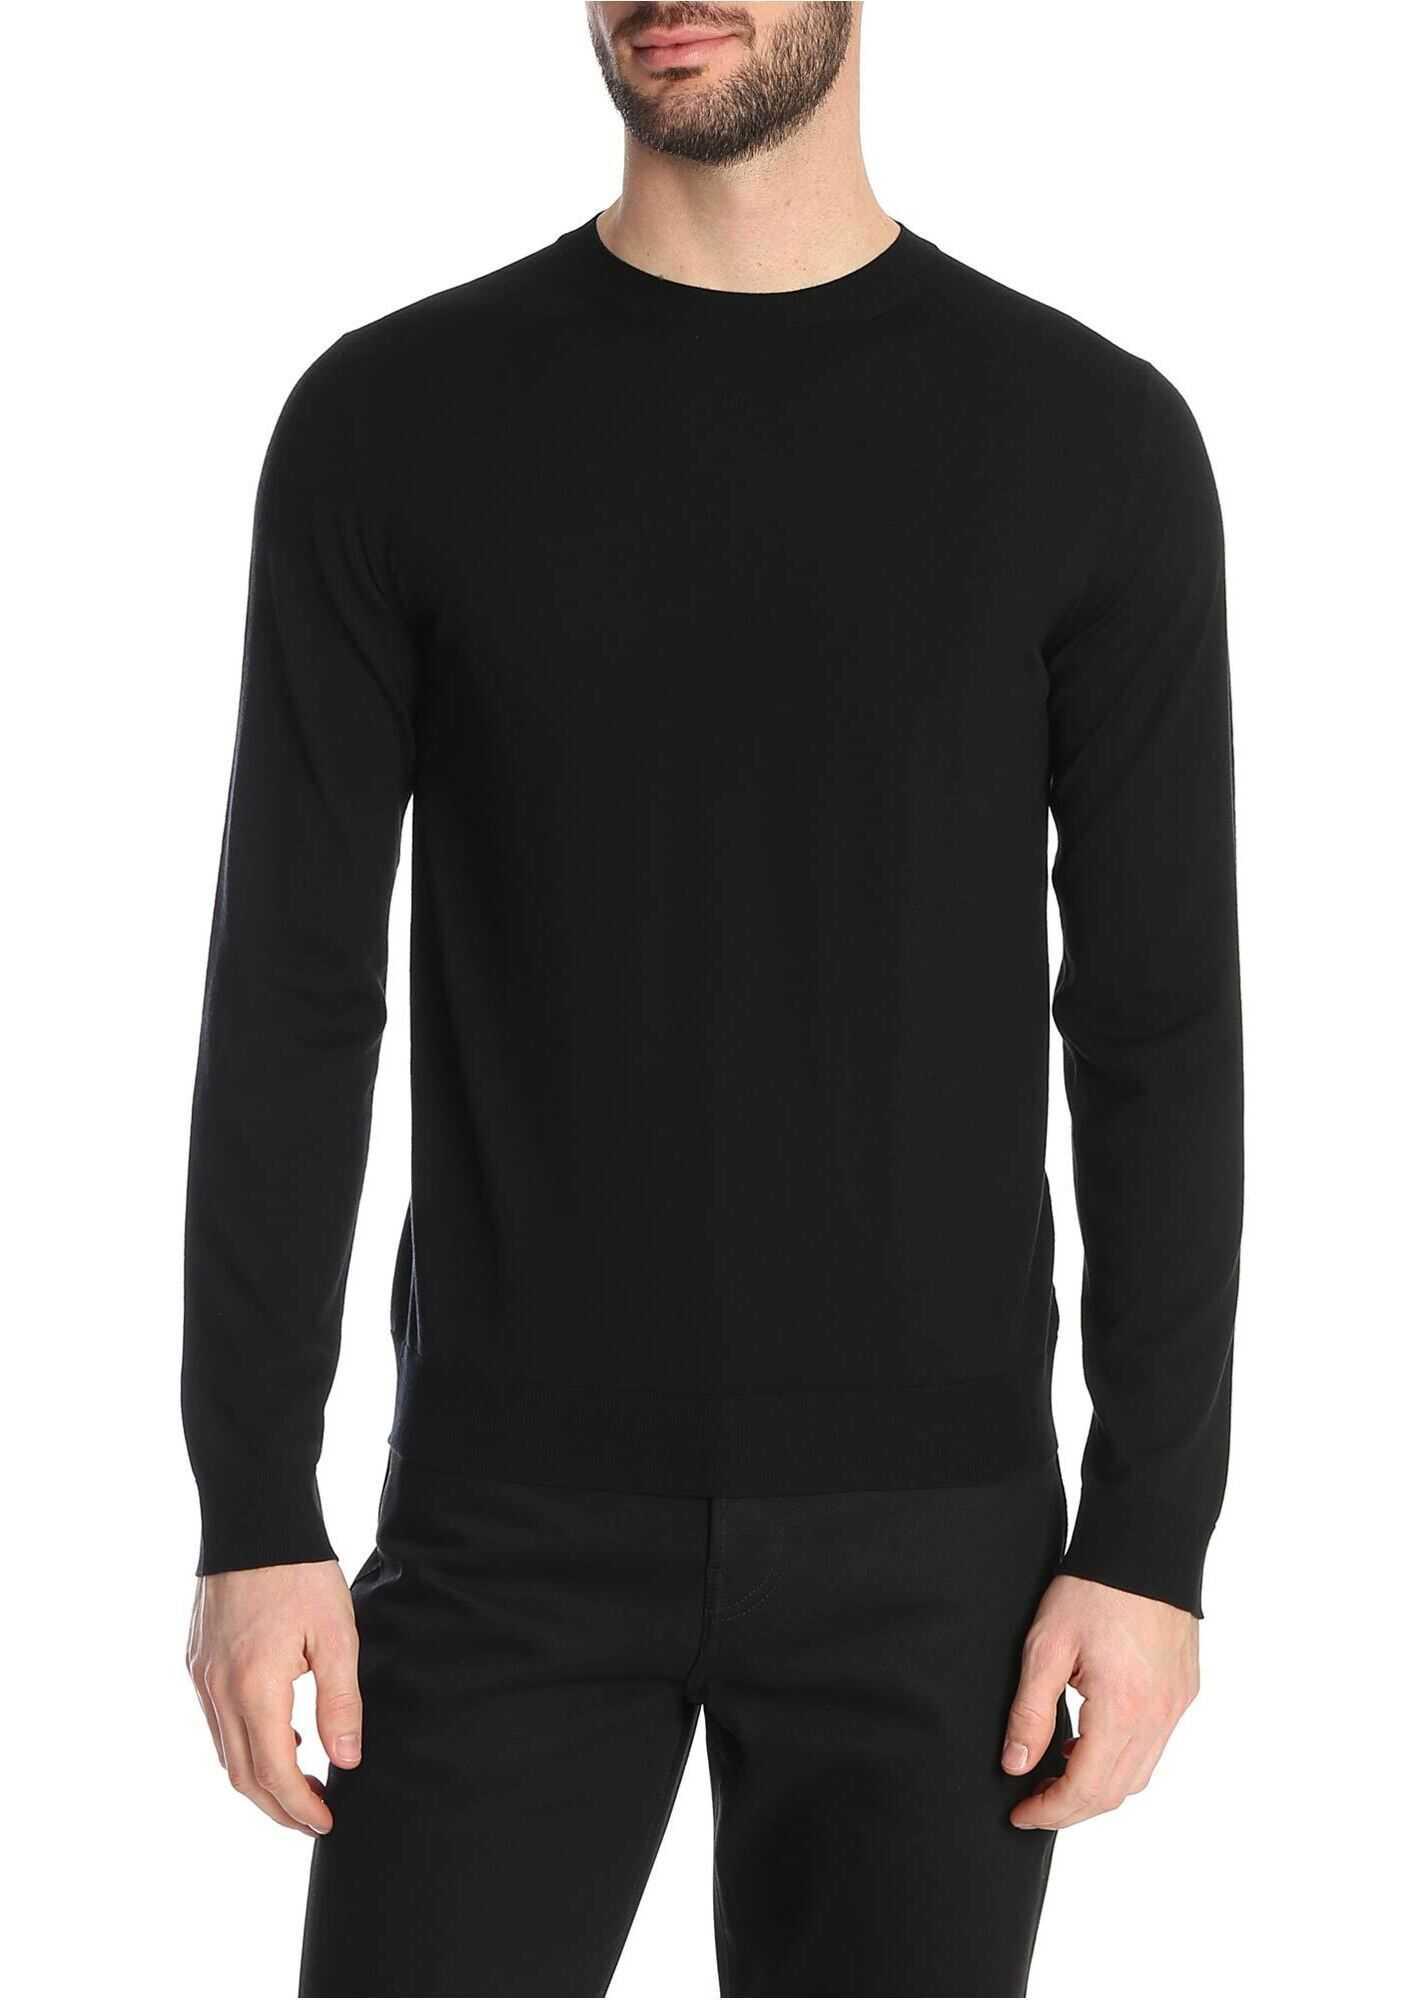 Valentino Garavani Crew-Neck Pullover In Black With Stud Detail Black imagine